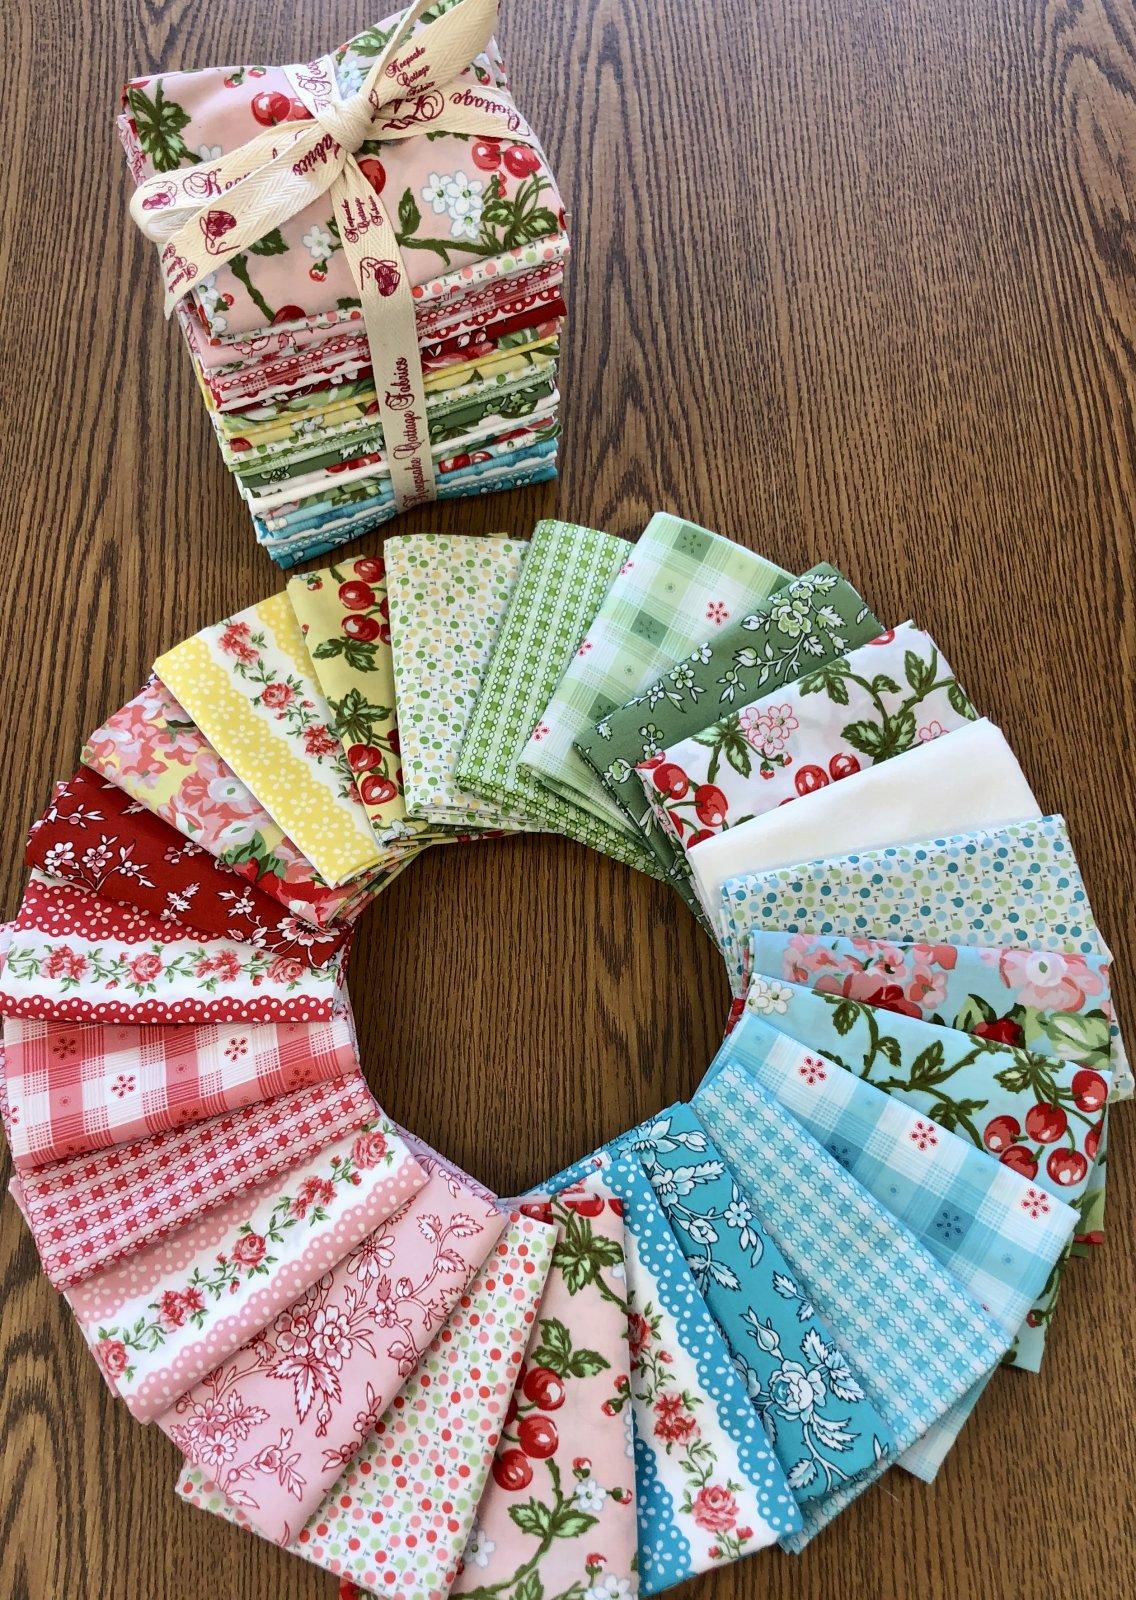 Flower Garden Fat Quarter Bundle by Eleanor Burns